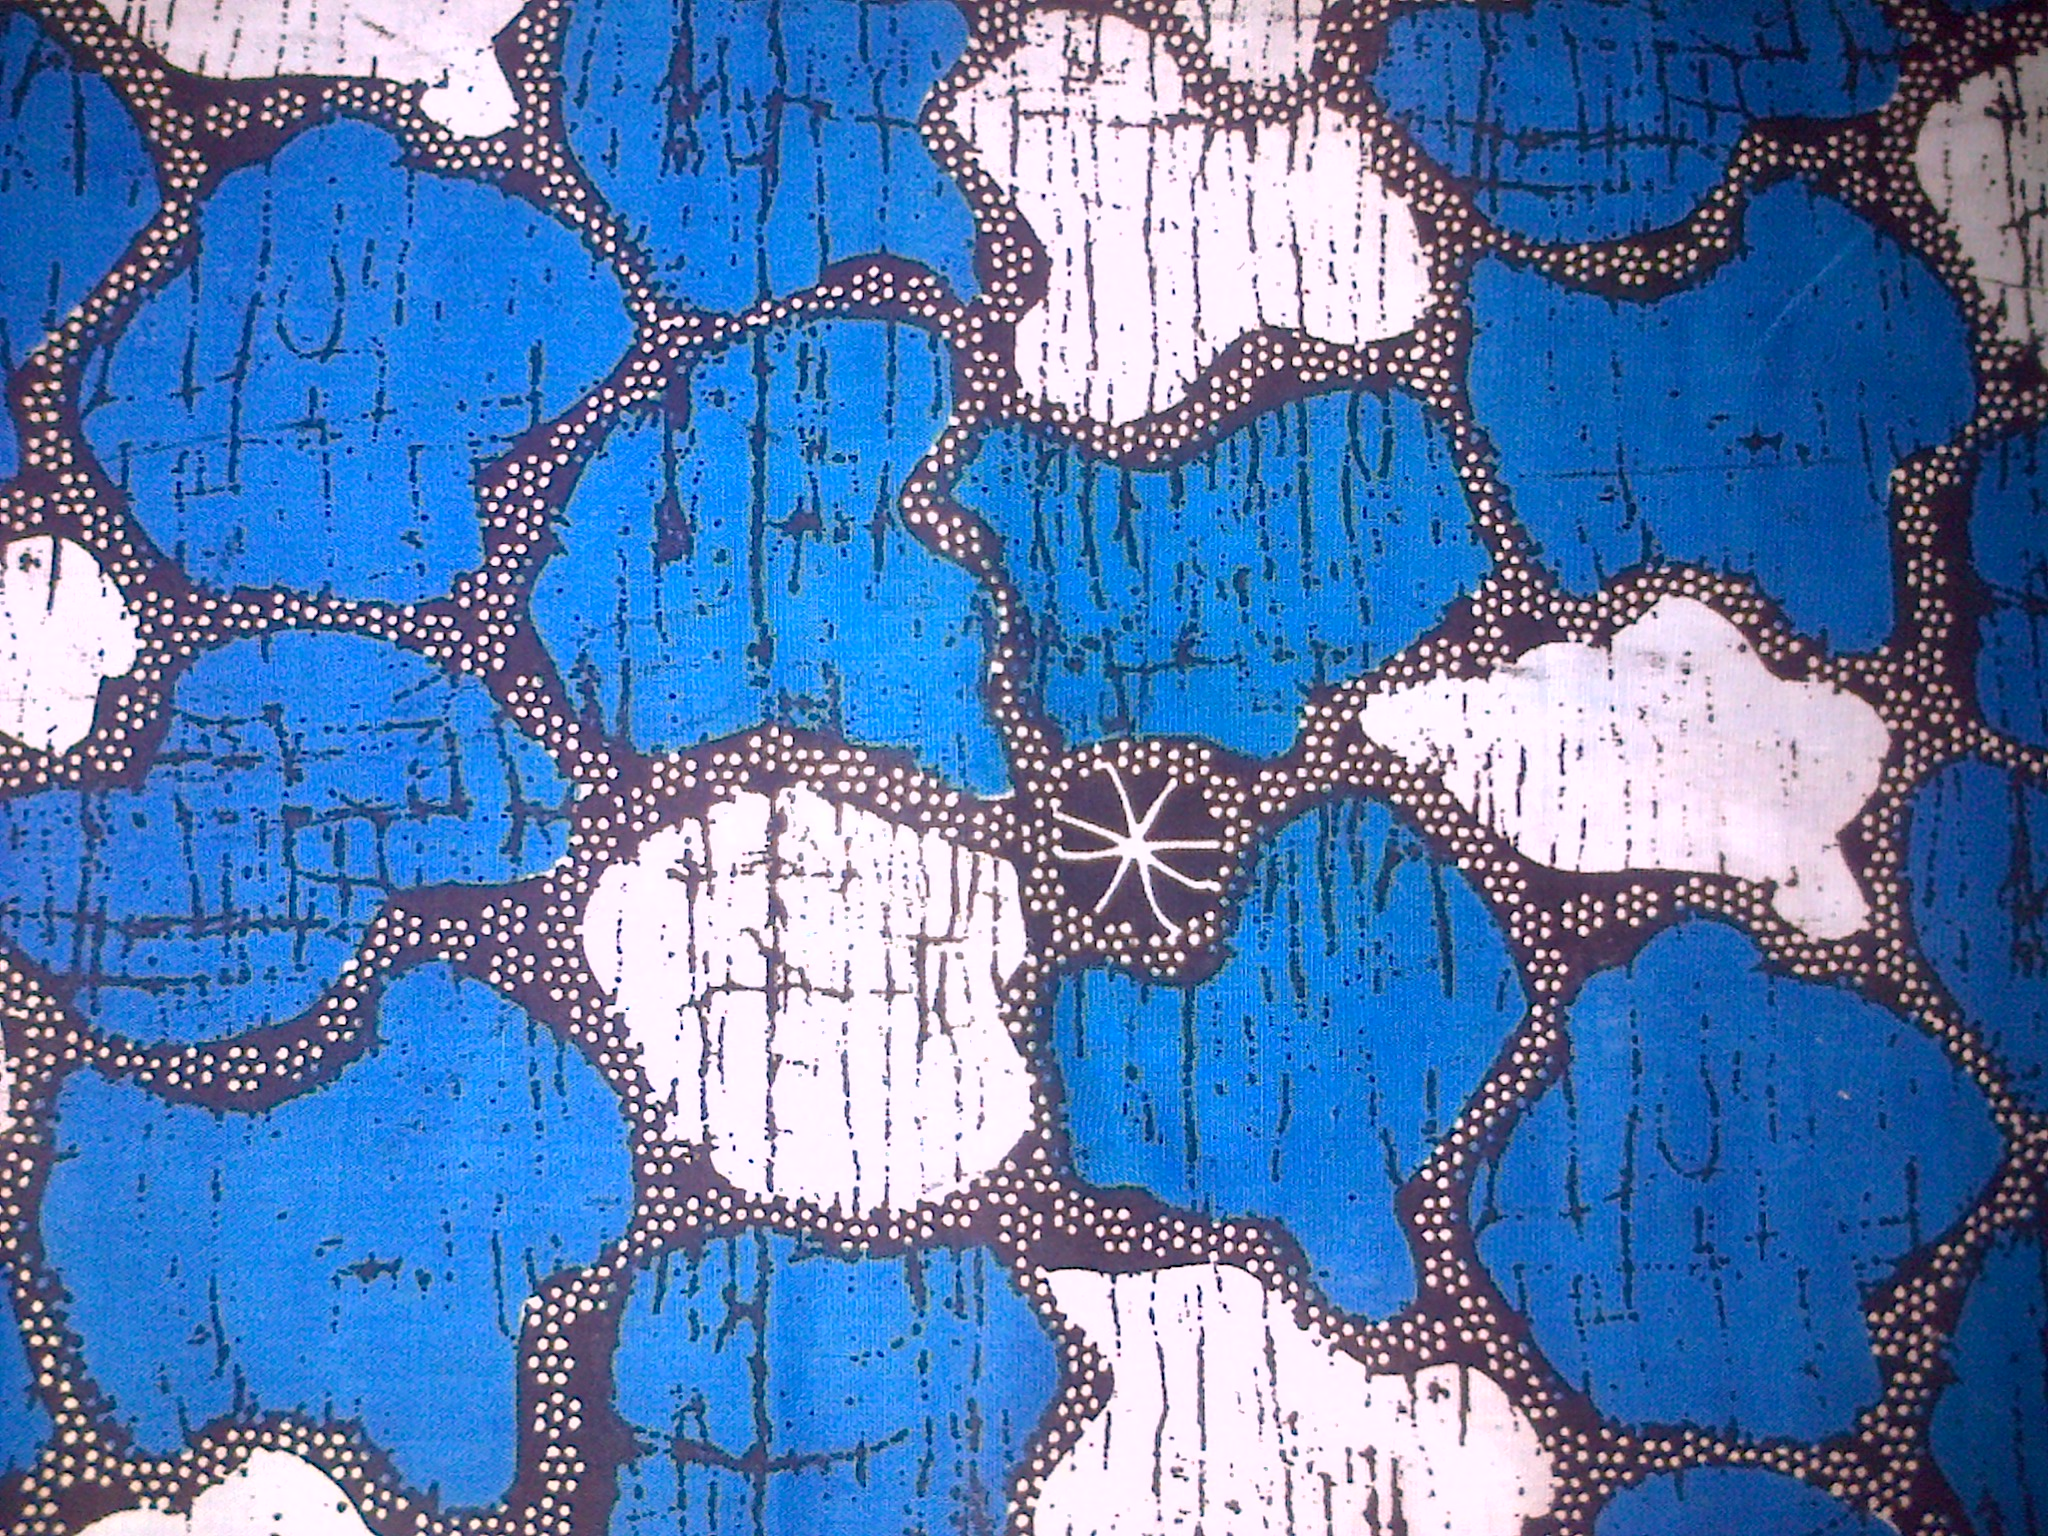 baju batik modern pekalongan – Harga kain Batik ArGreen Collection ...